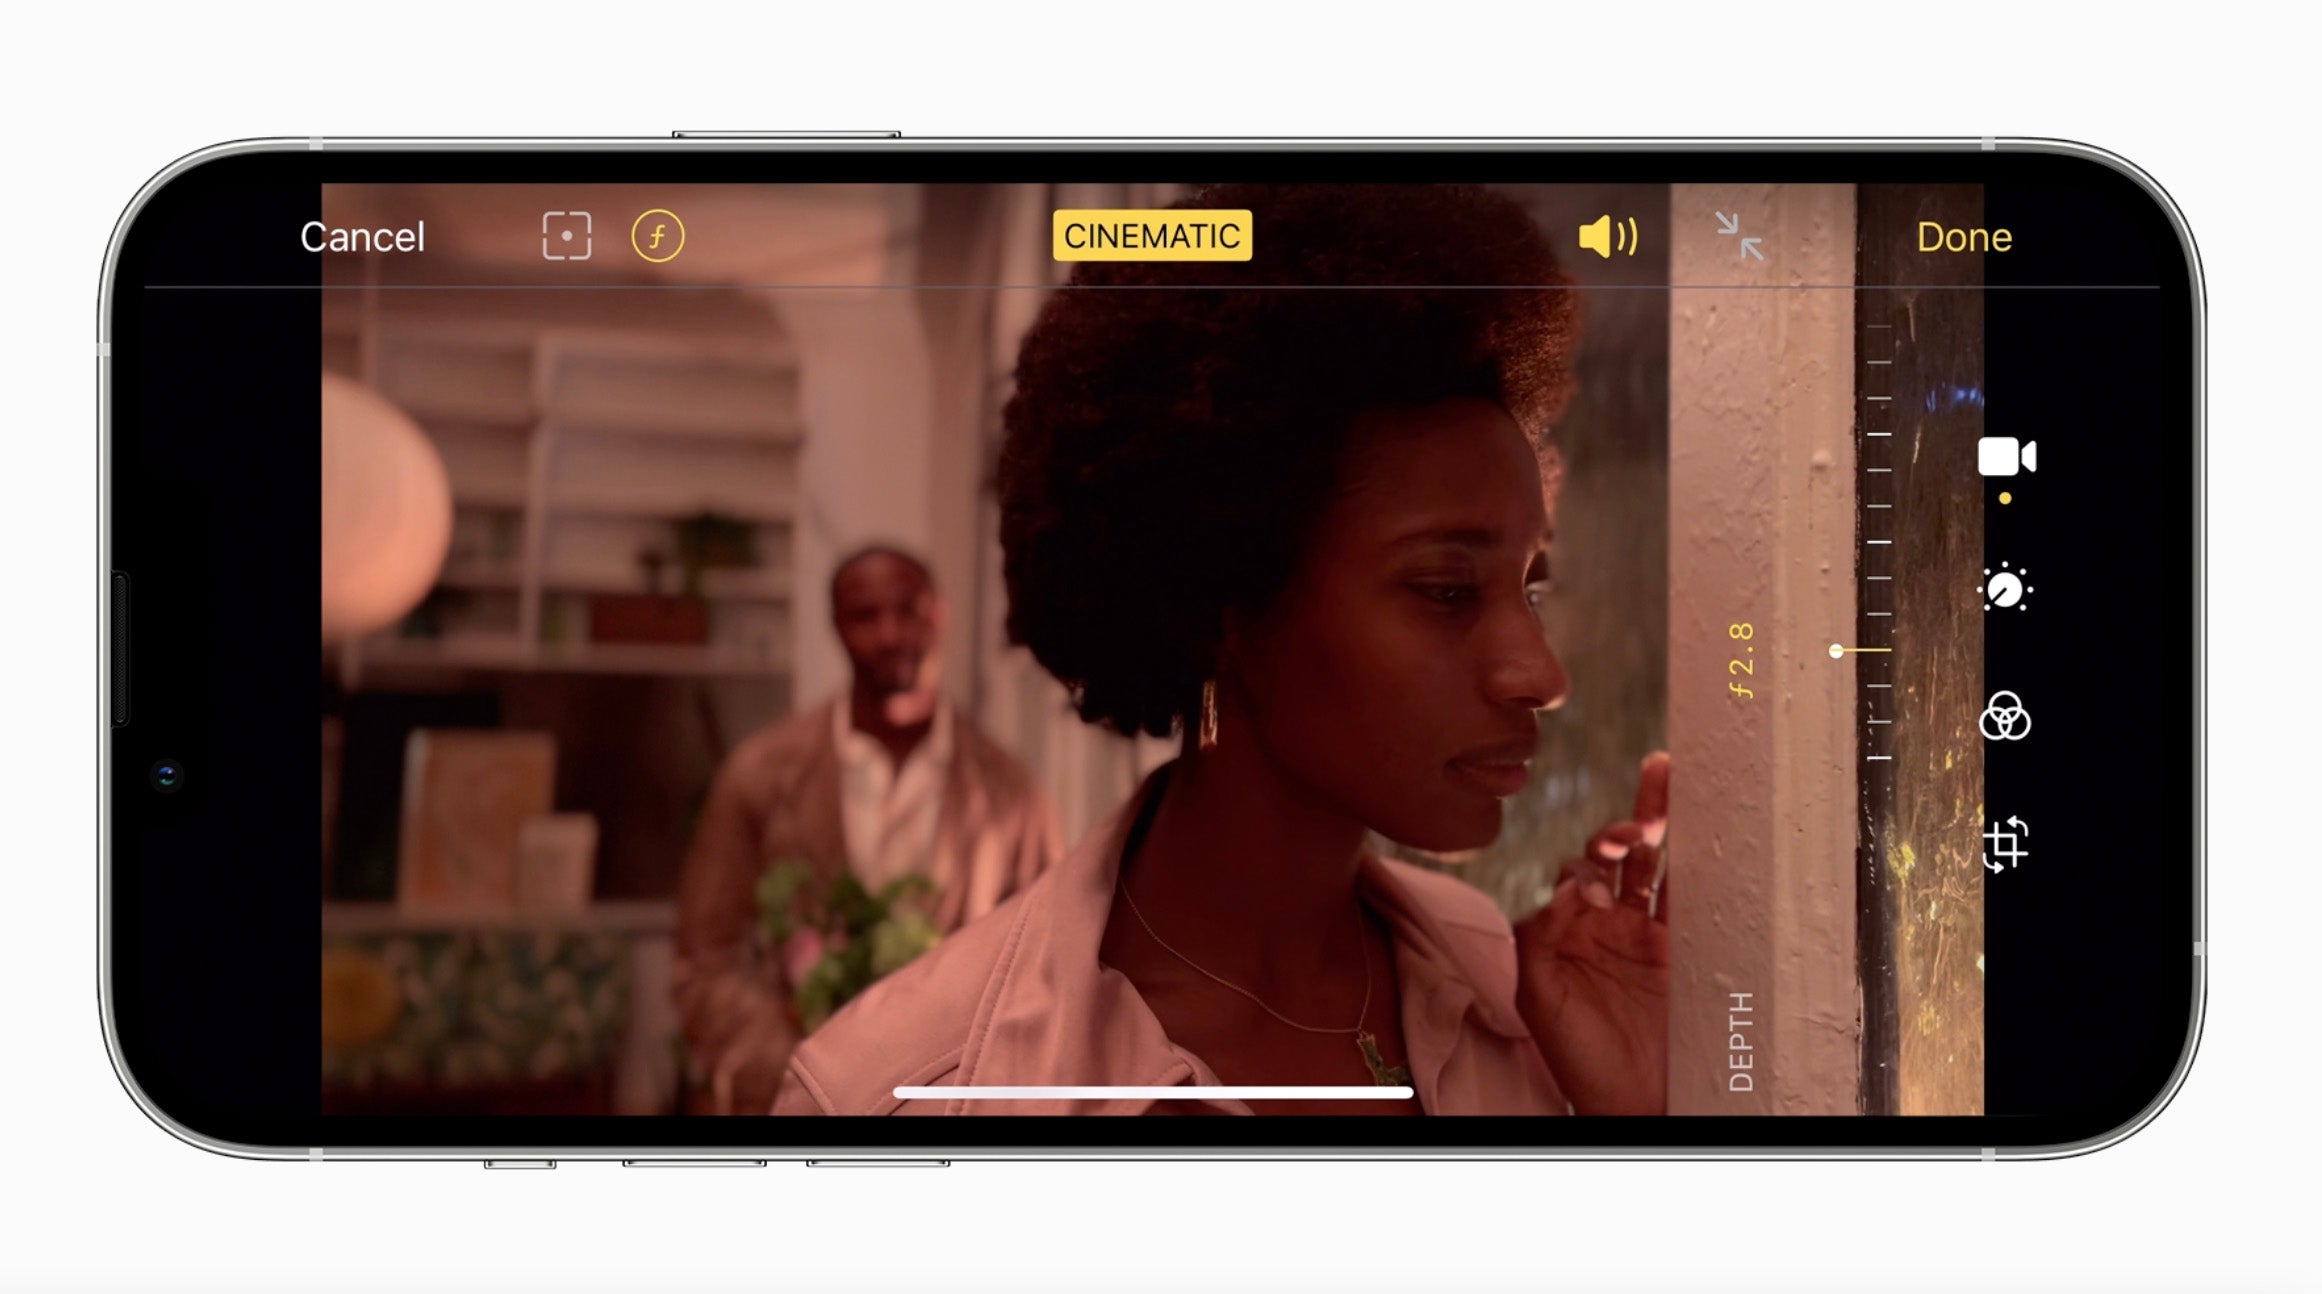 Apple's new cinematic mode